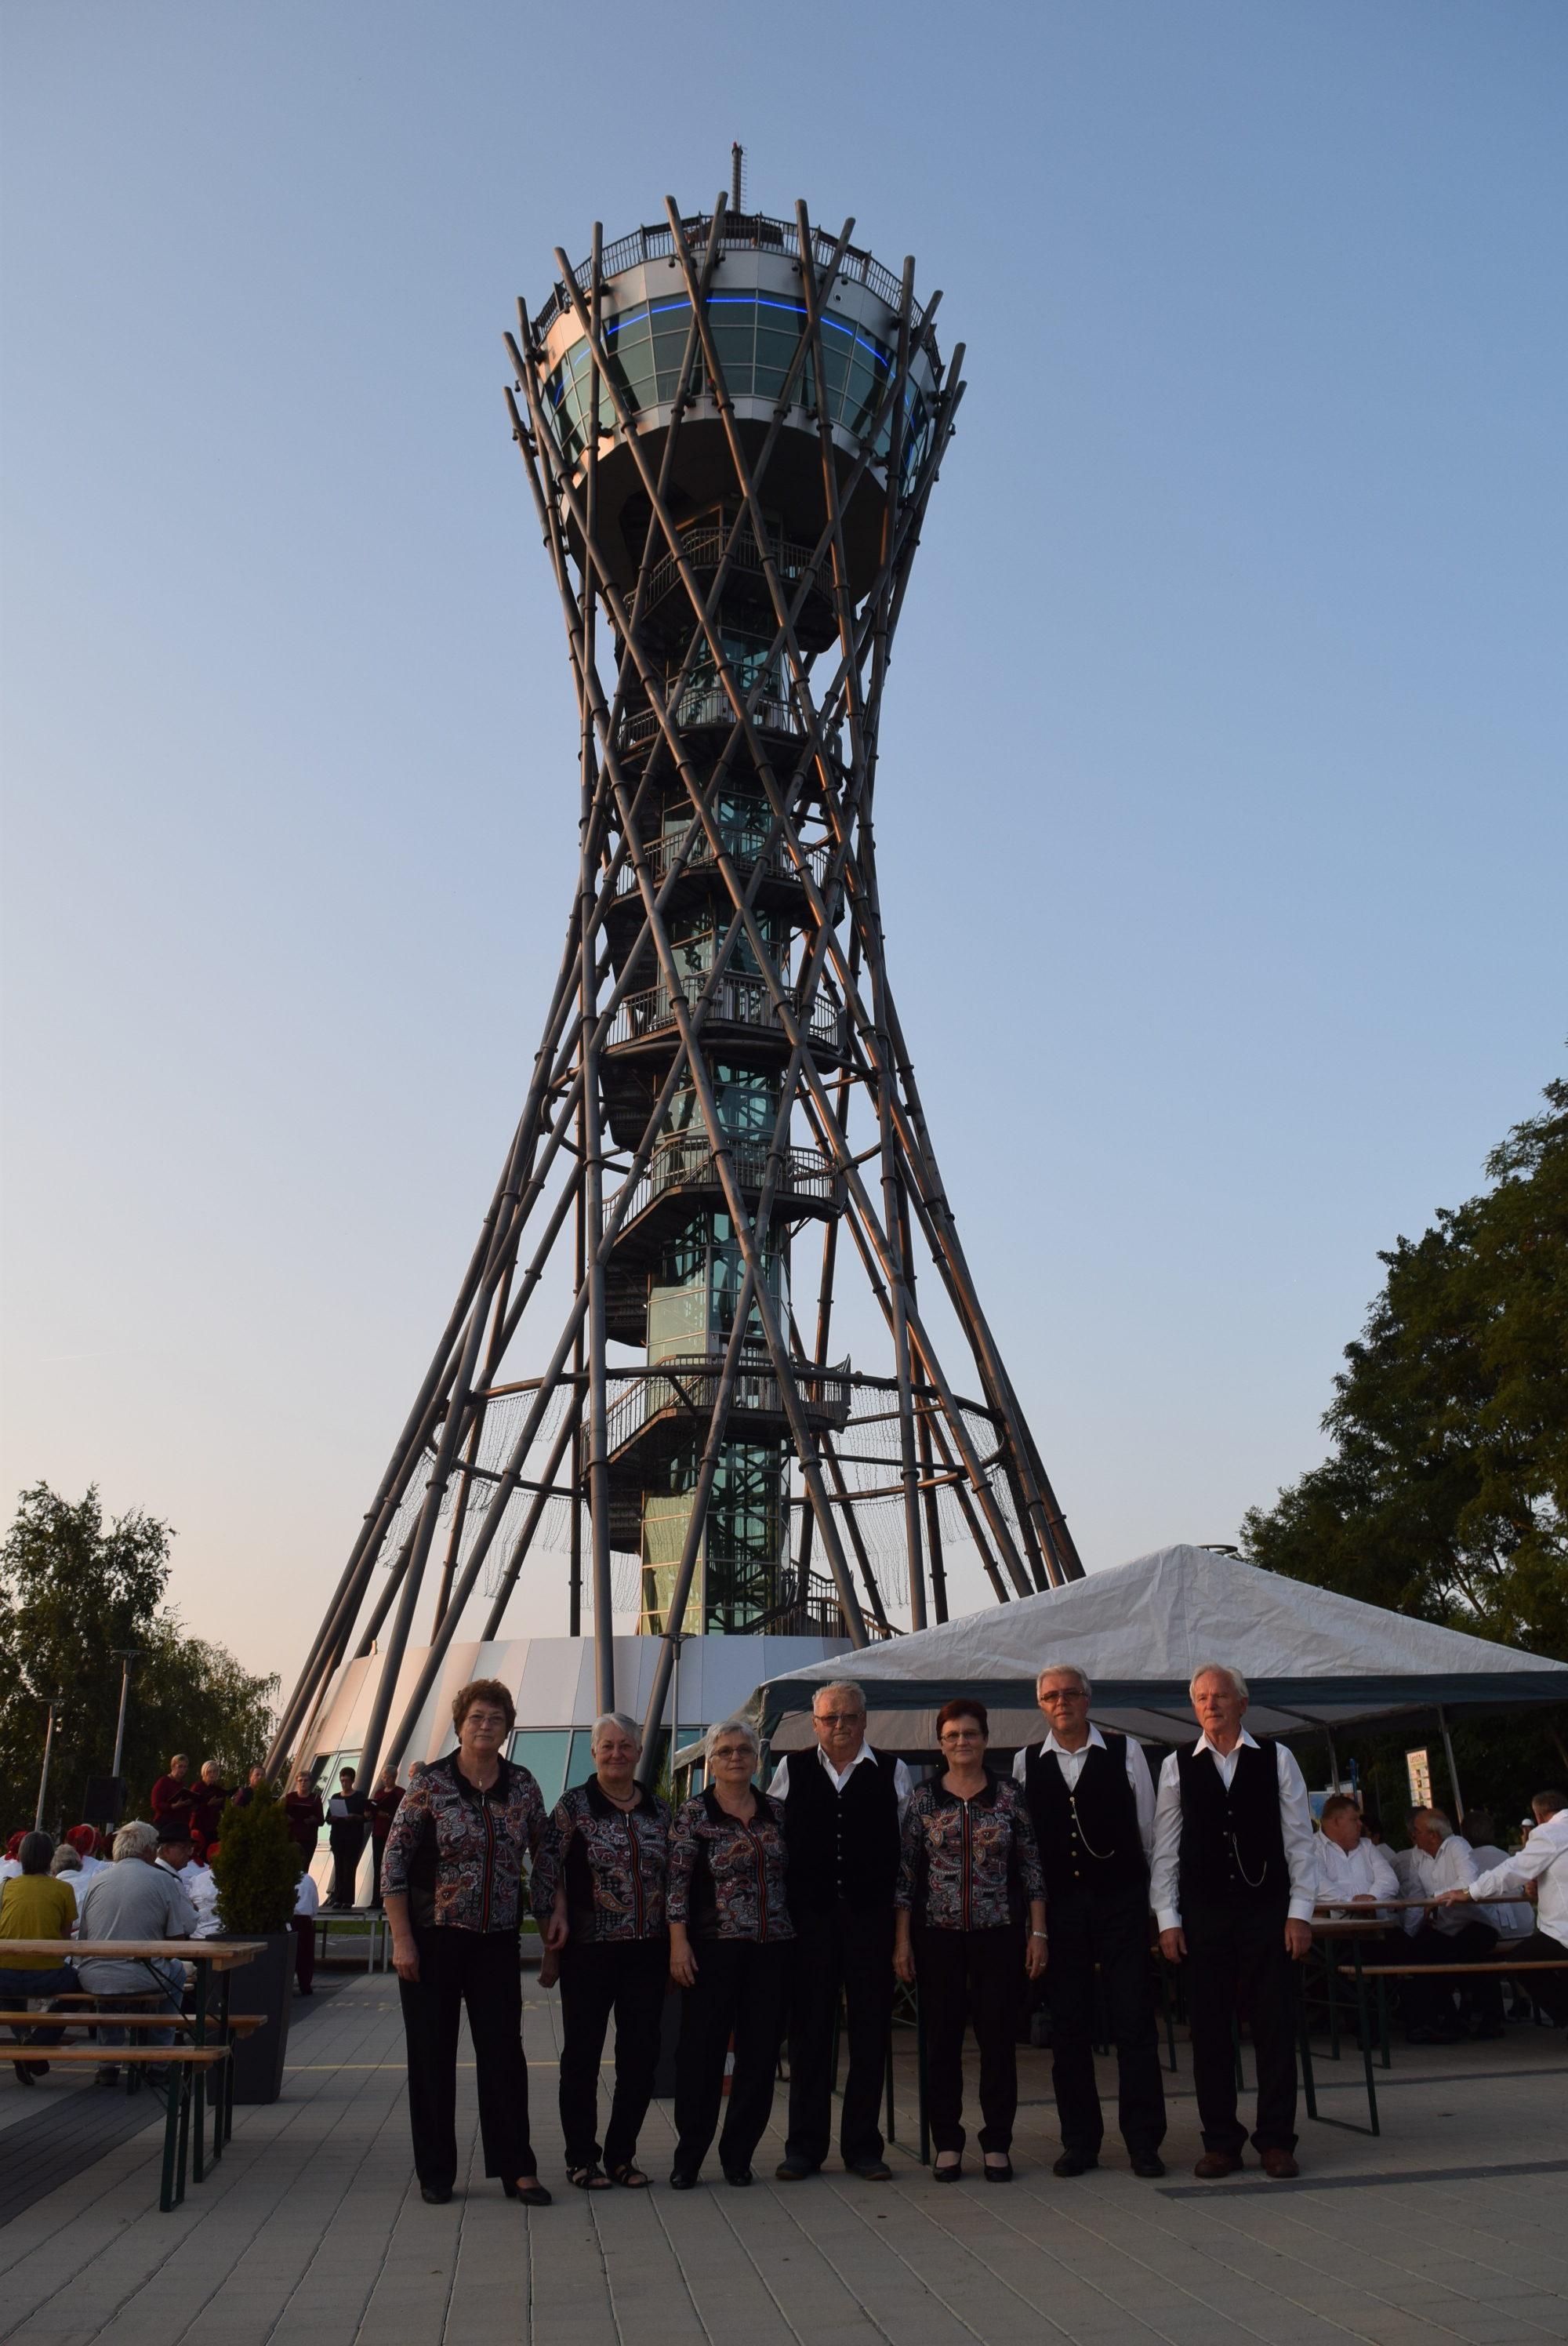 pred-stolpom-vinarium-v-lendavskih-goricah